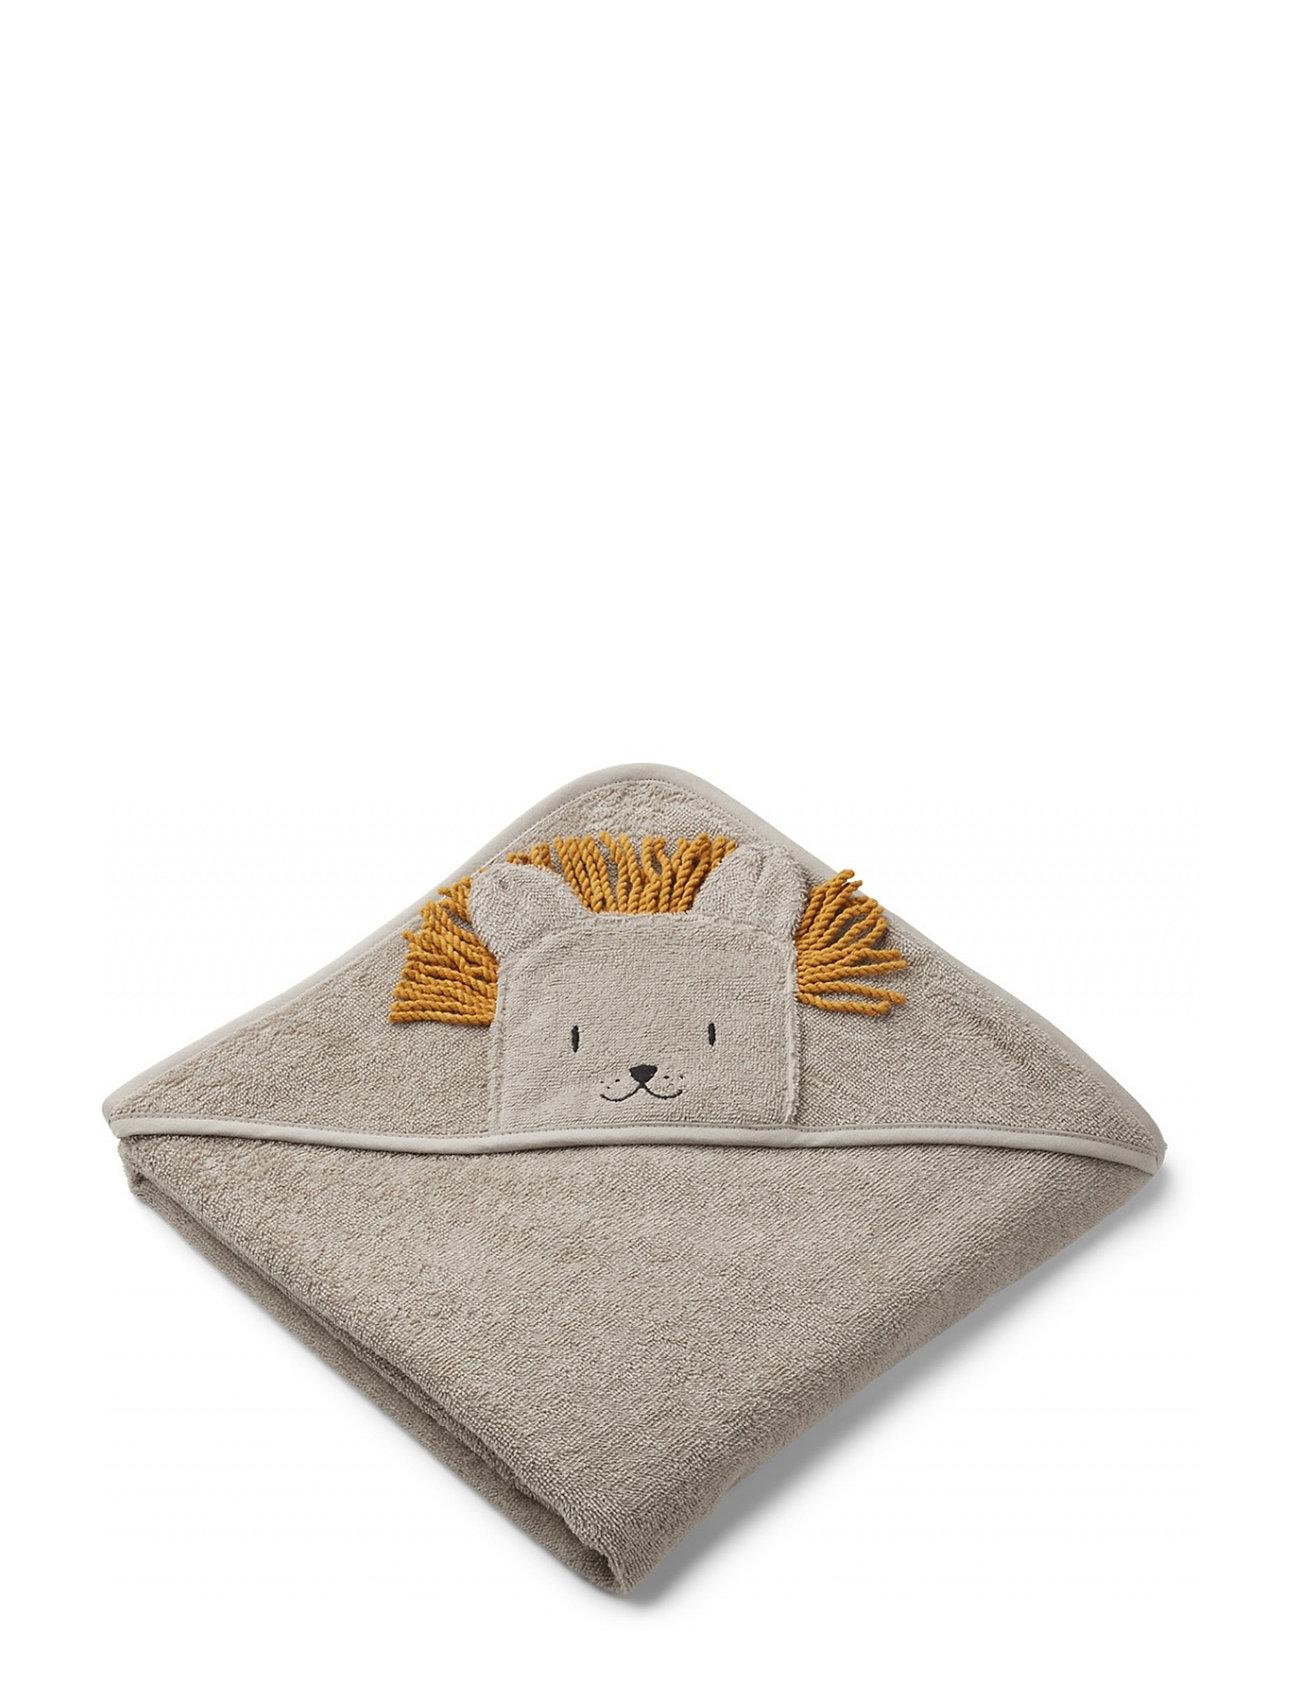 Liewood Augusta hooded towel - LION STONE BEIGE